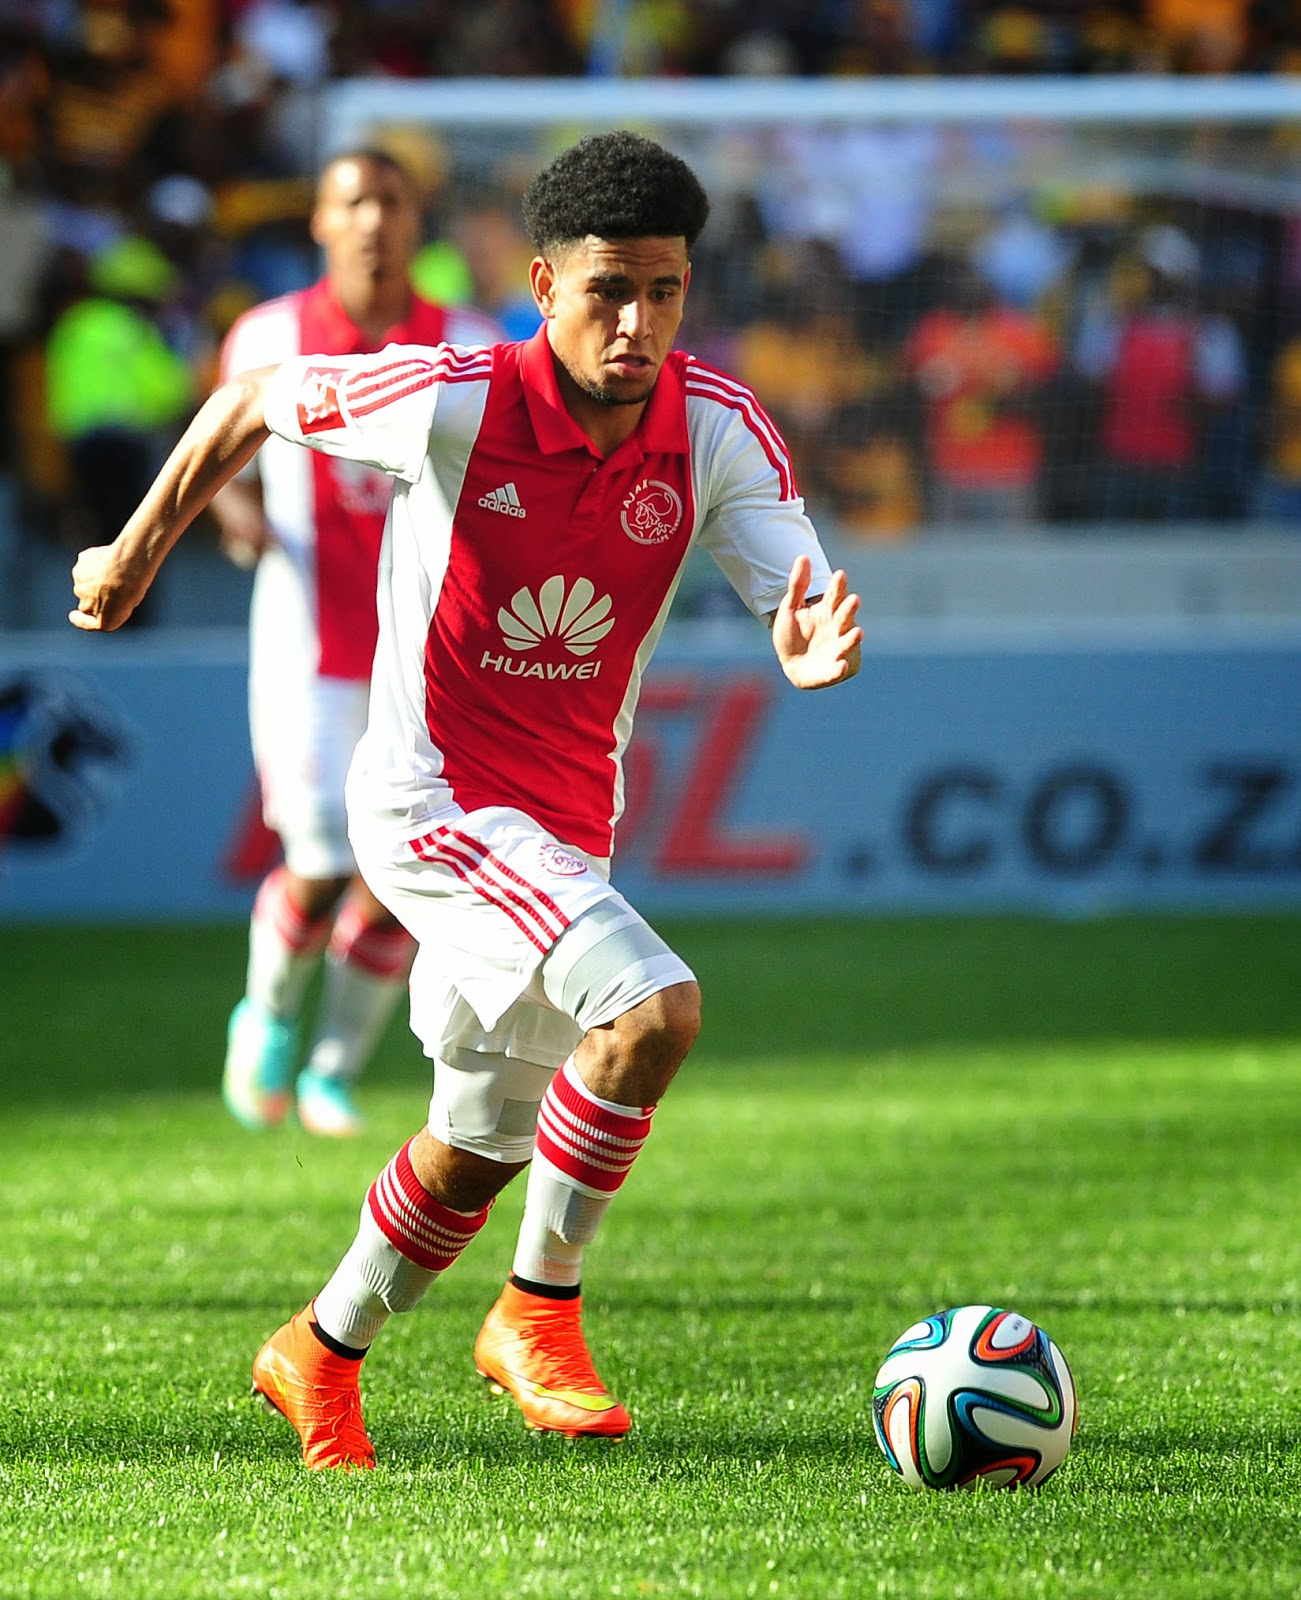 ccccc0c5a2e SBN - Soccer Betting News - SA s Leading Soccer Betting .